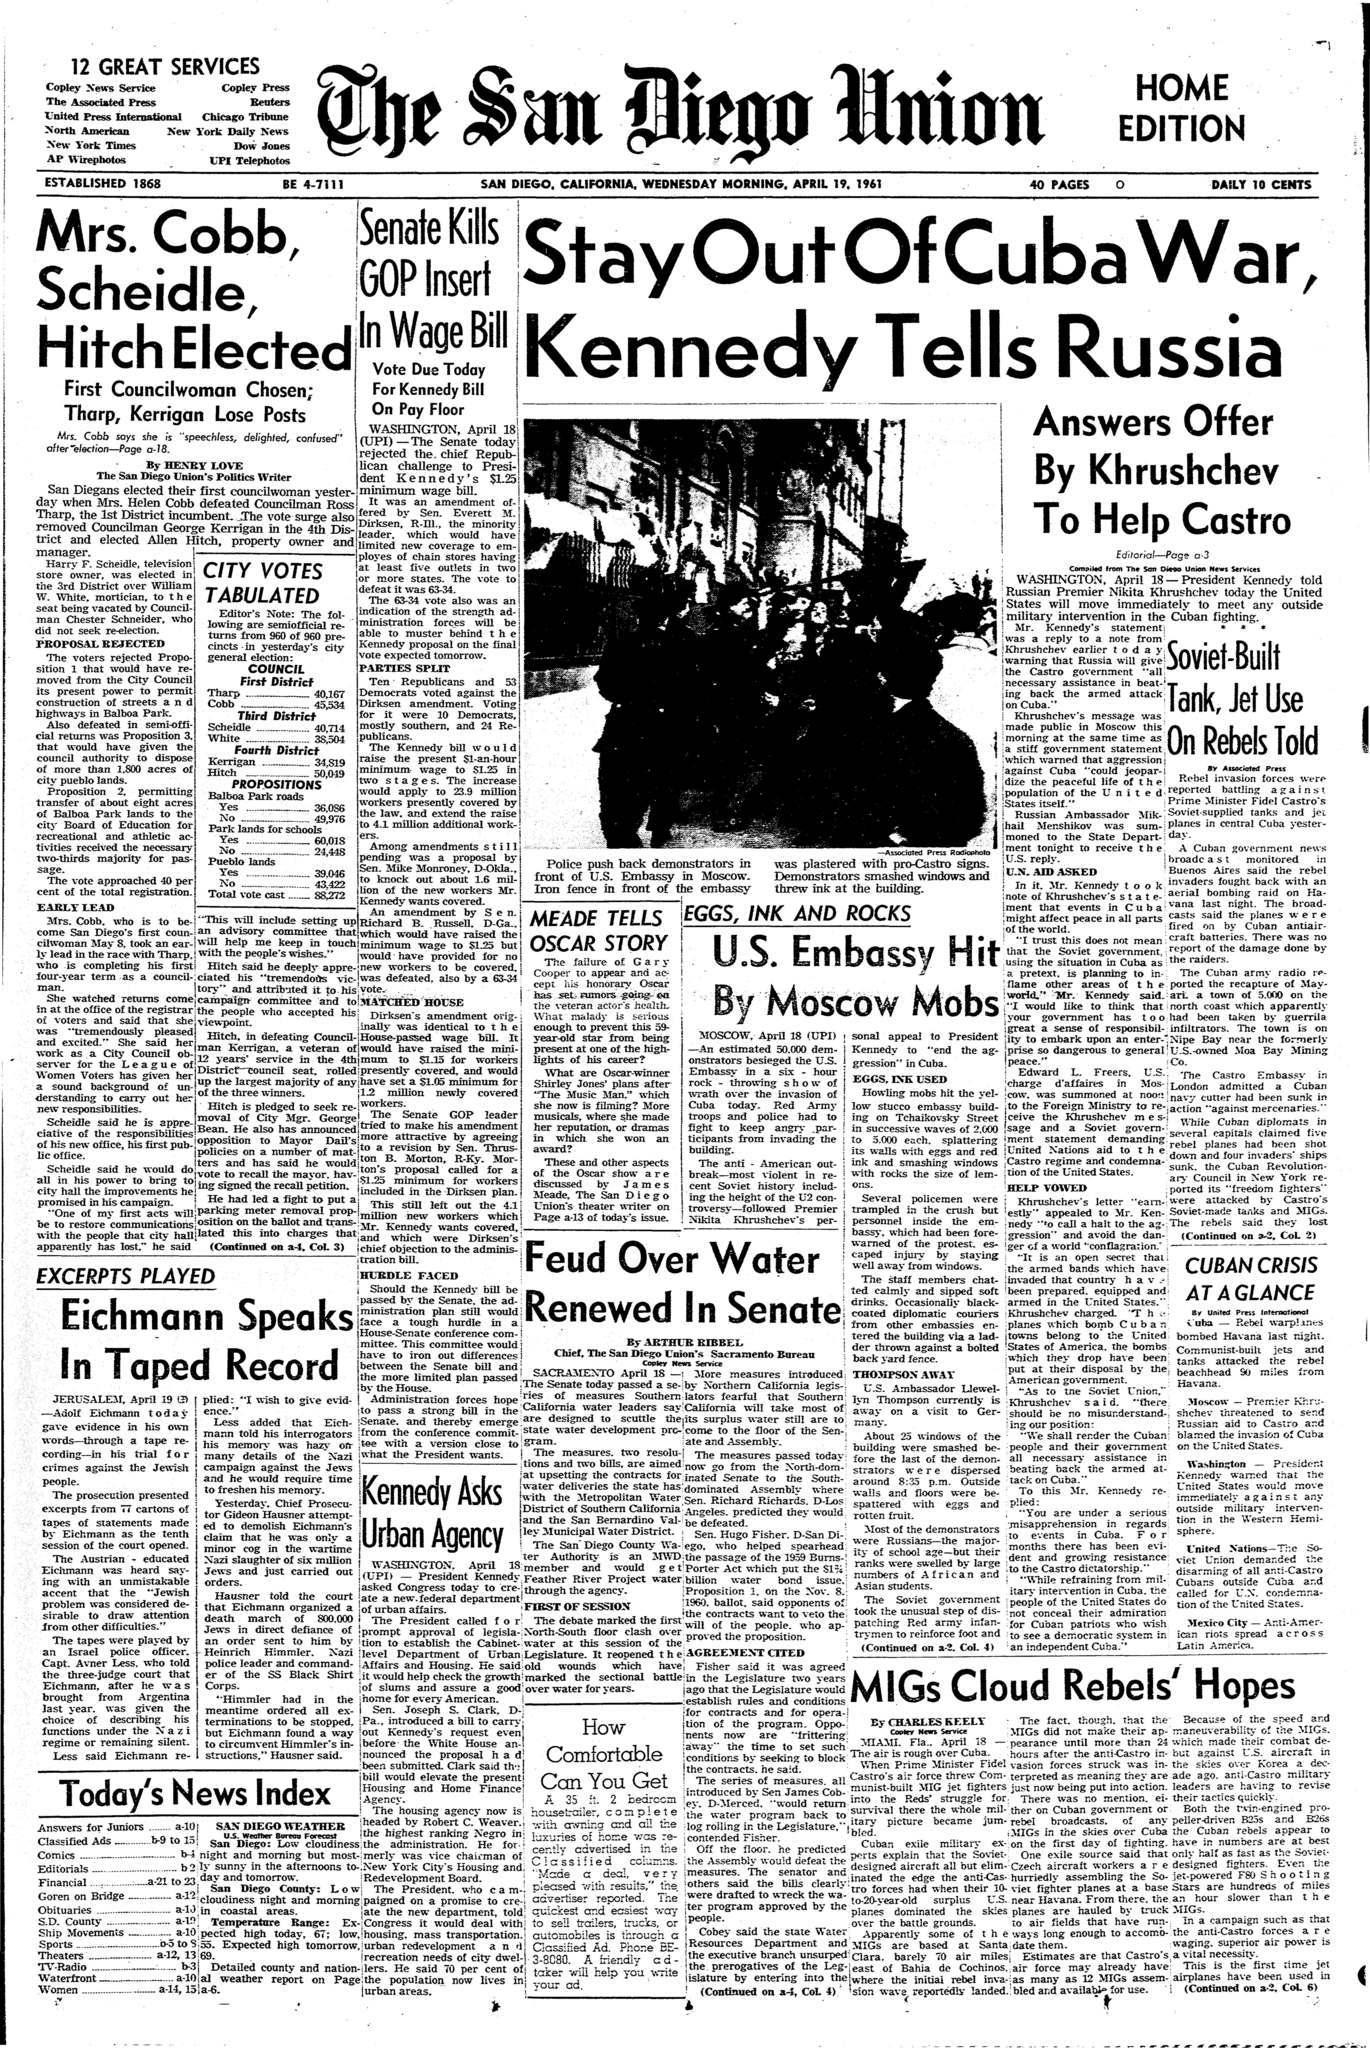 April 19, 1961